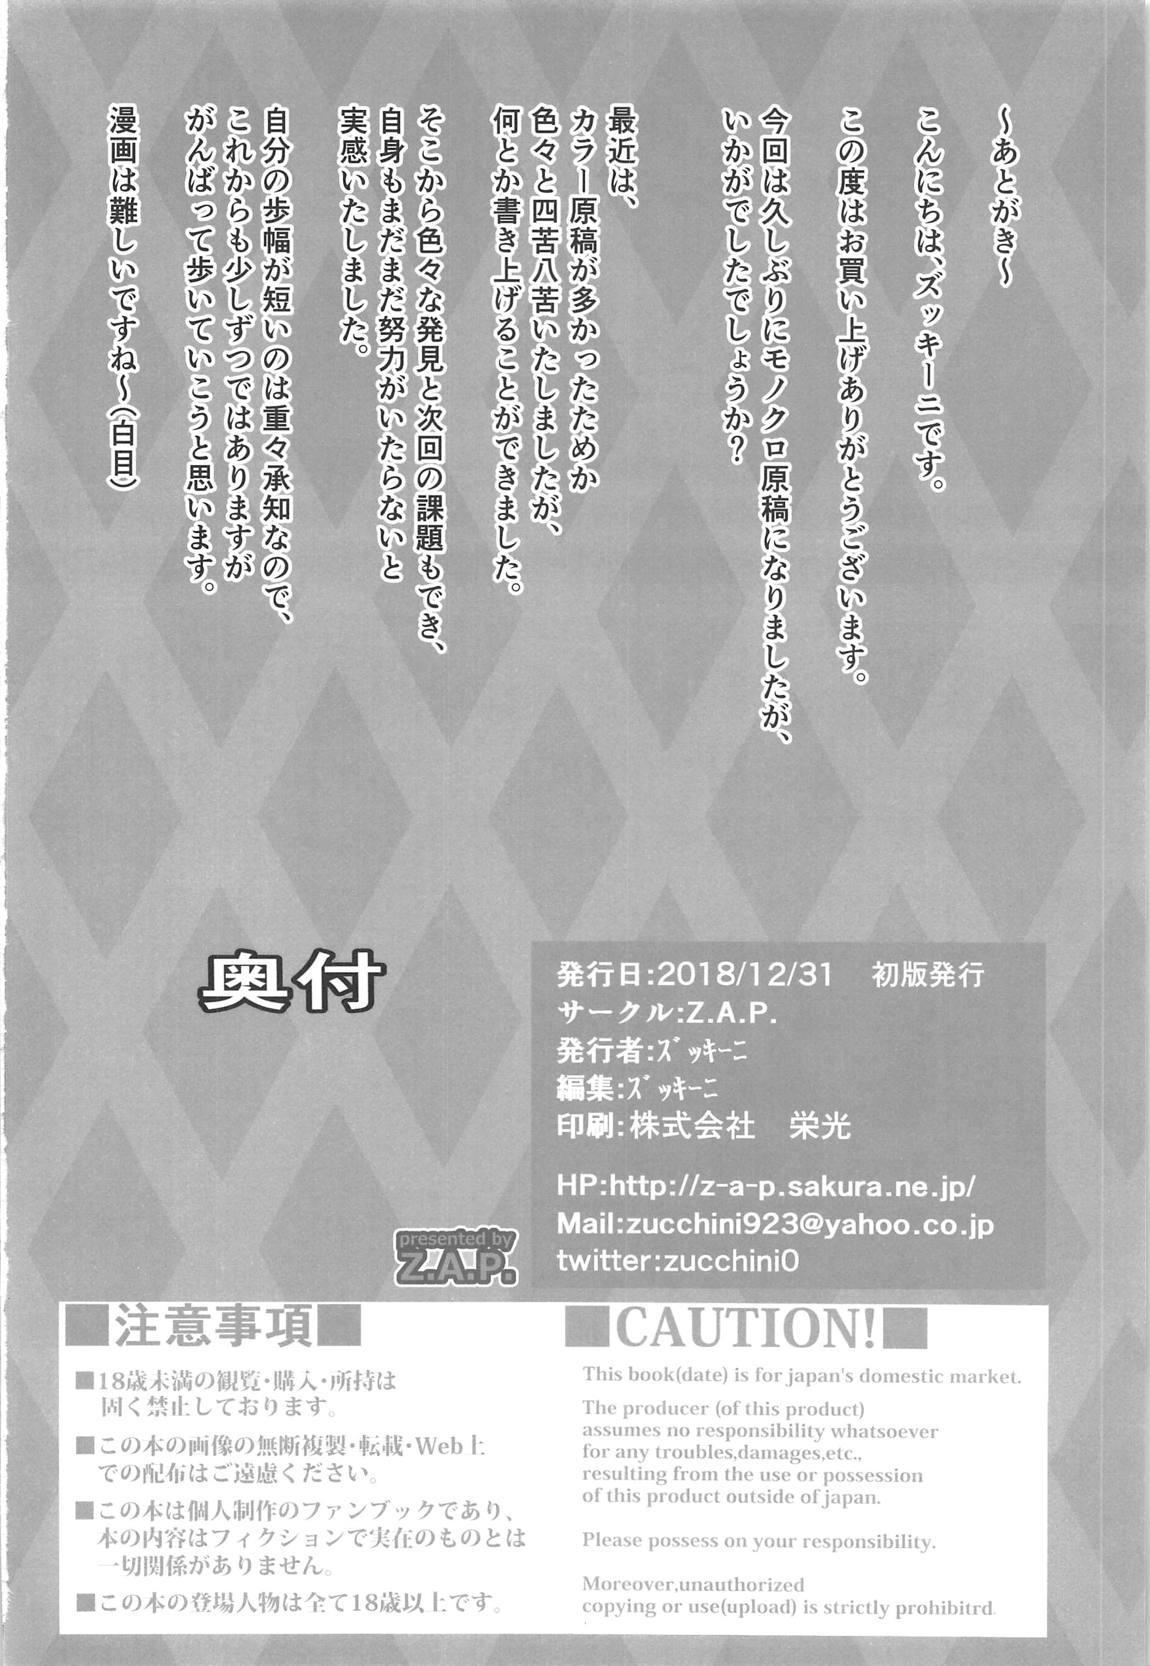 (C95) [Z.A.P. (Zucchini)] Ritsuka-kun no Sainan? 2 ~Nerawareta Kohitsuji!?~ | Ritsuka-kun's Misfortune? 2 The Targeted Lamb!? (Fate/Grand Order) [English] [q91] 21